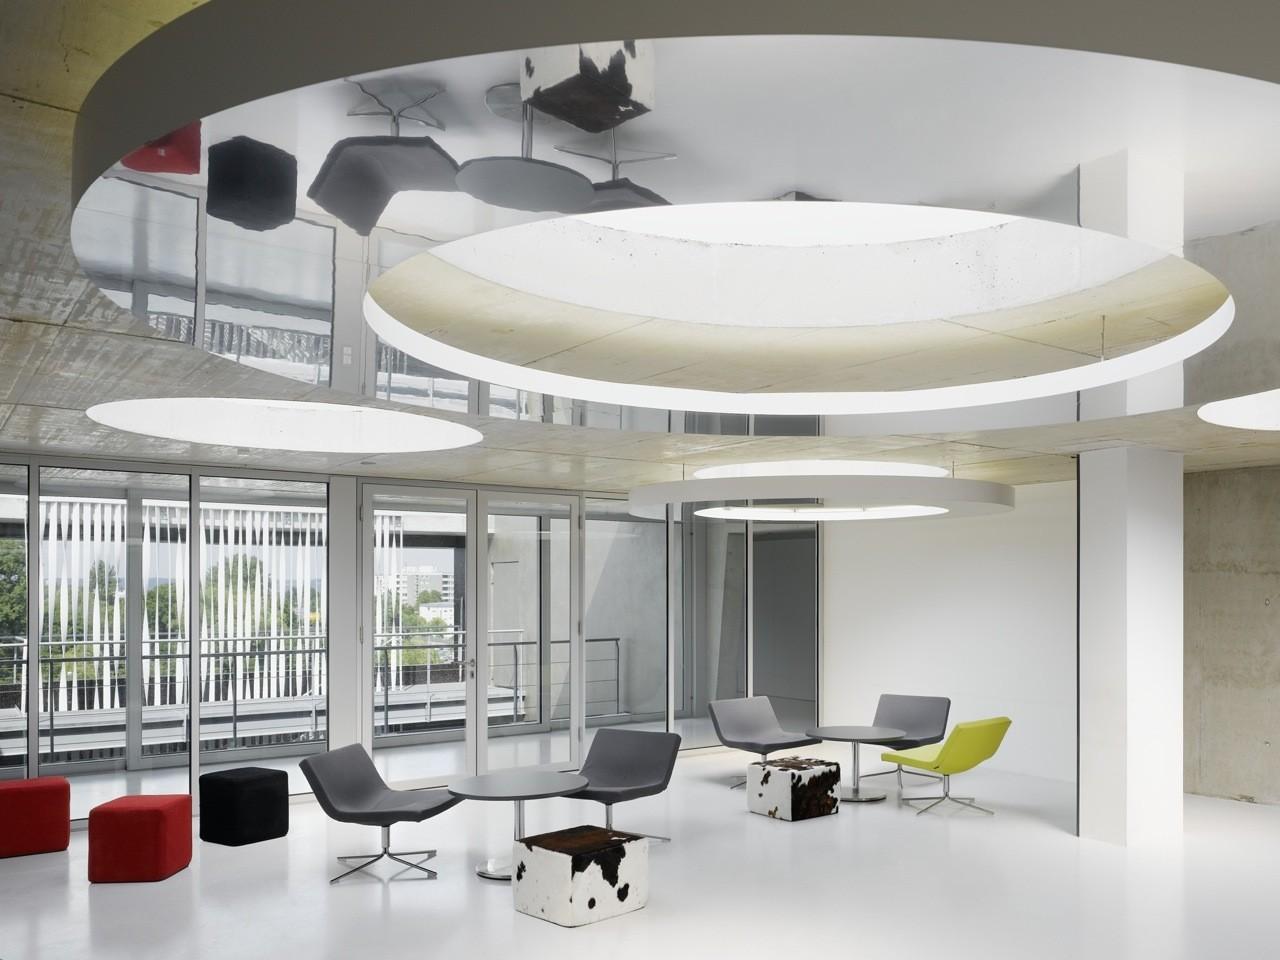 training centre for apprentice butchers wulf architekten. Black Bedroom Furniture Sets. Home Design Ideas